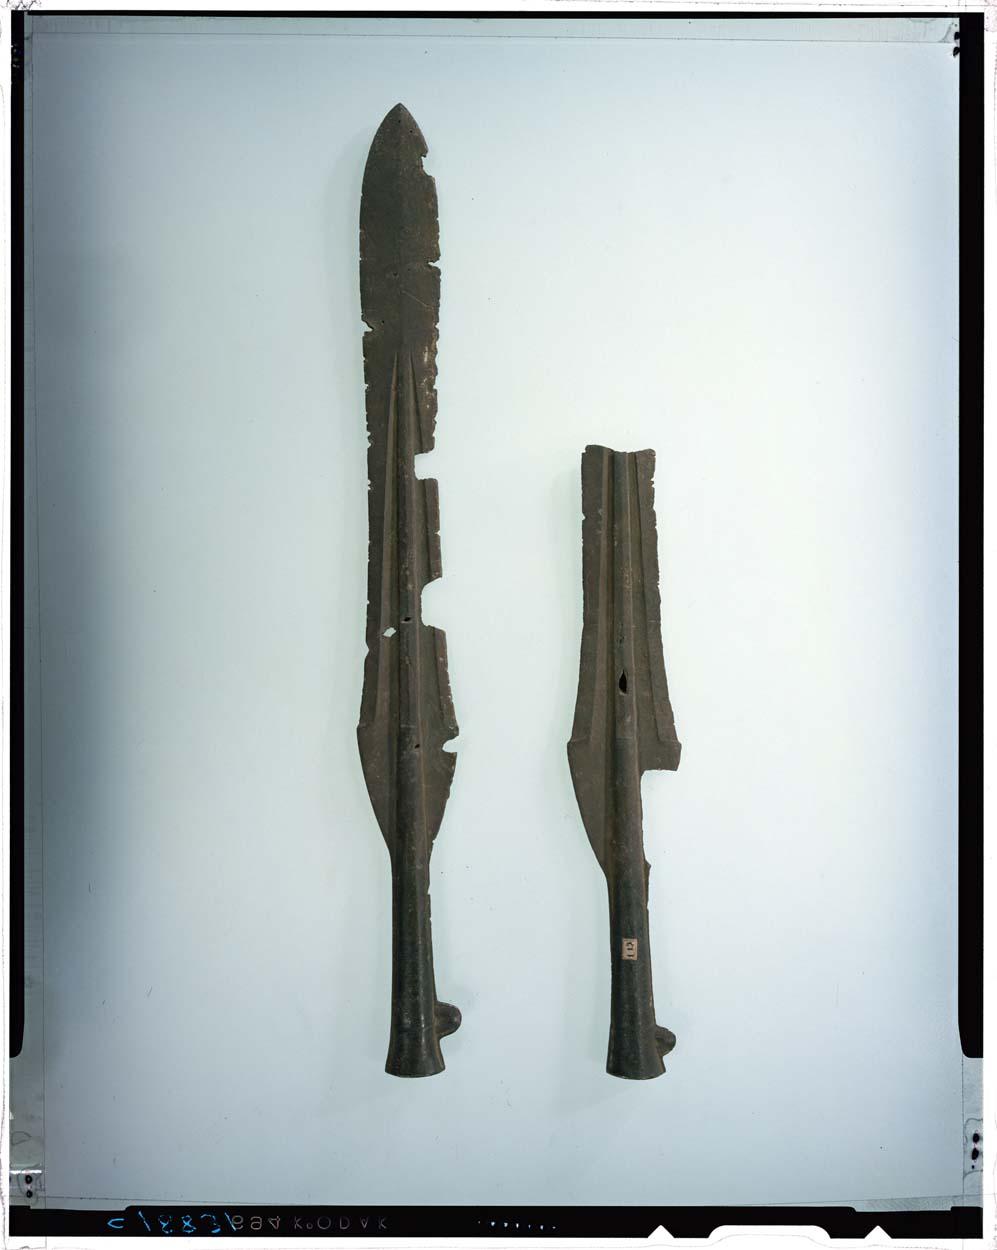 C0018831 銅矛 - 東京国立博物館 画像検索